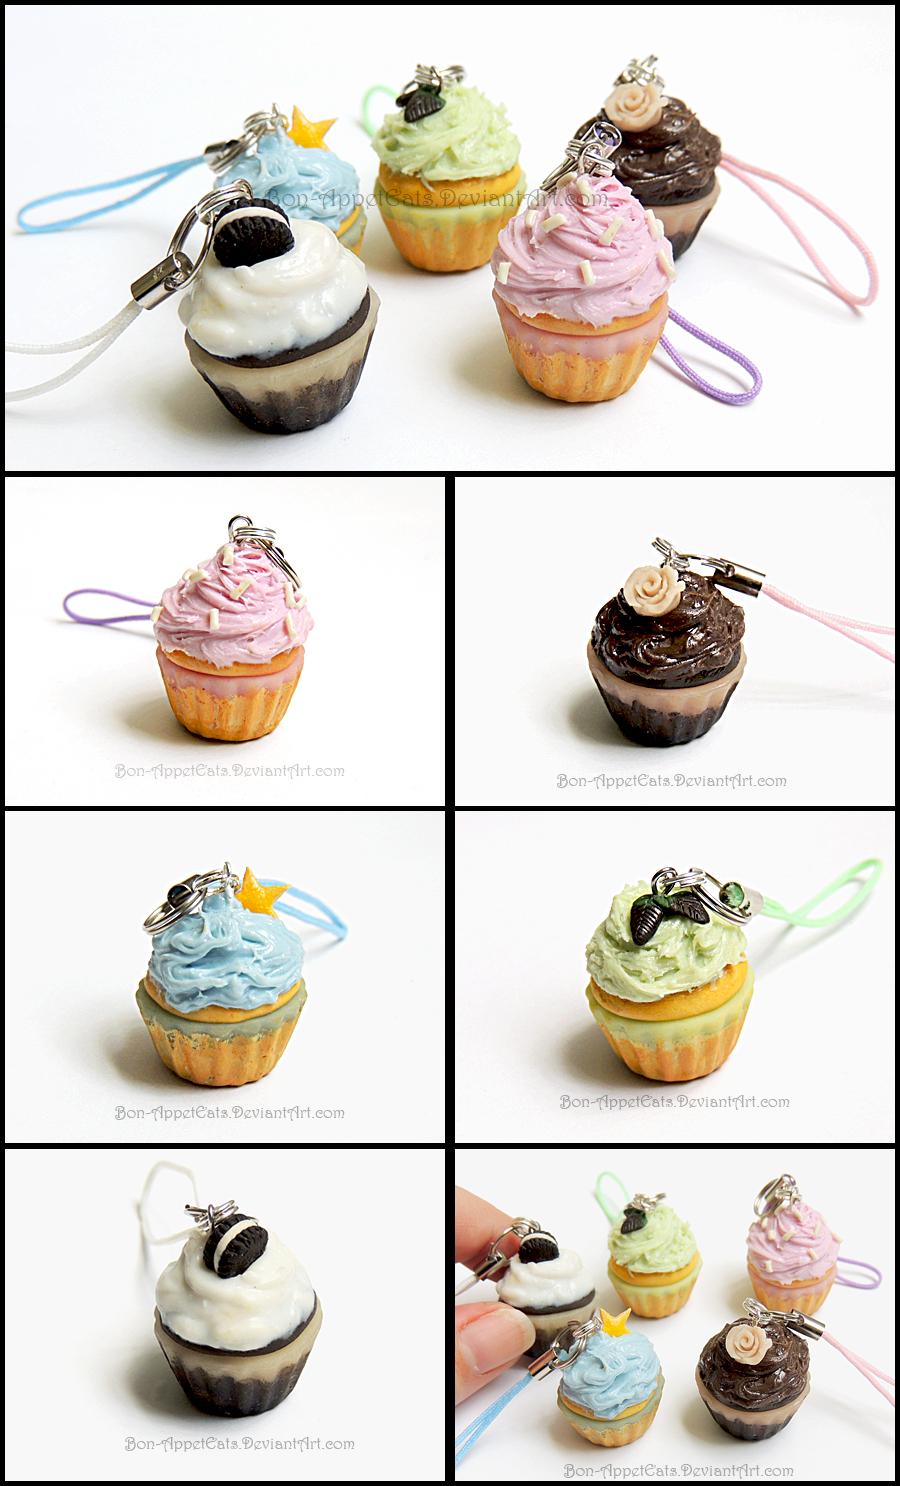 Cupcake Charms by Bon-AppetEats